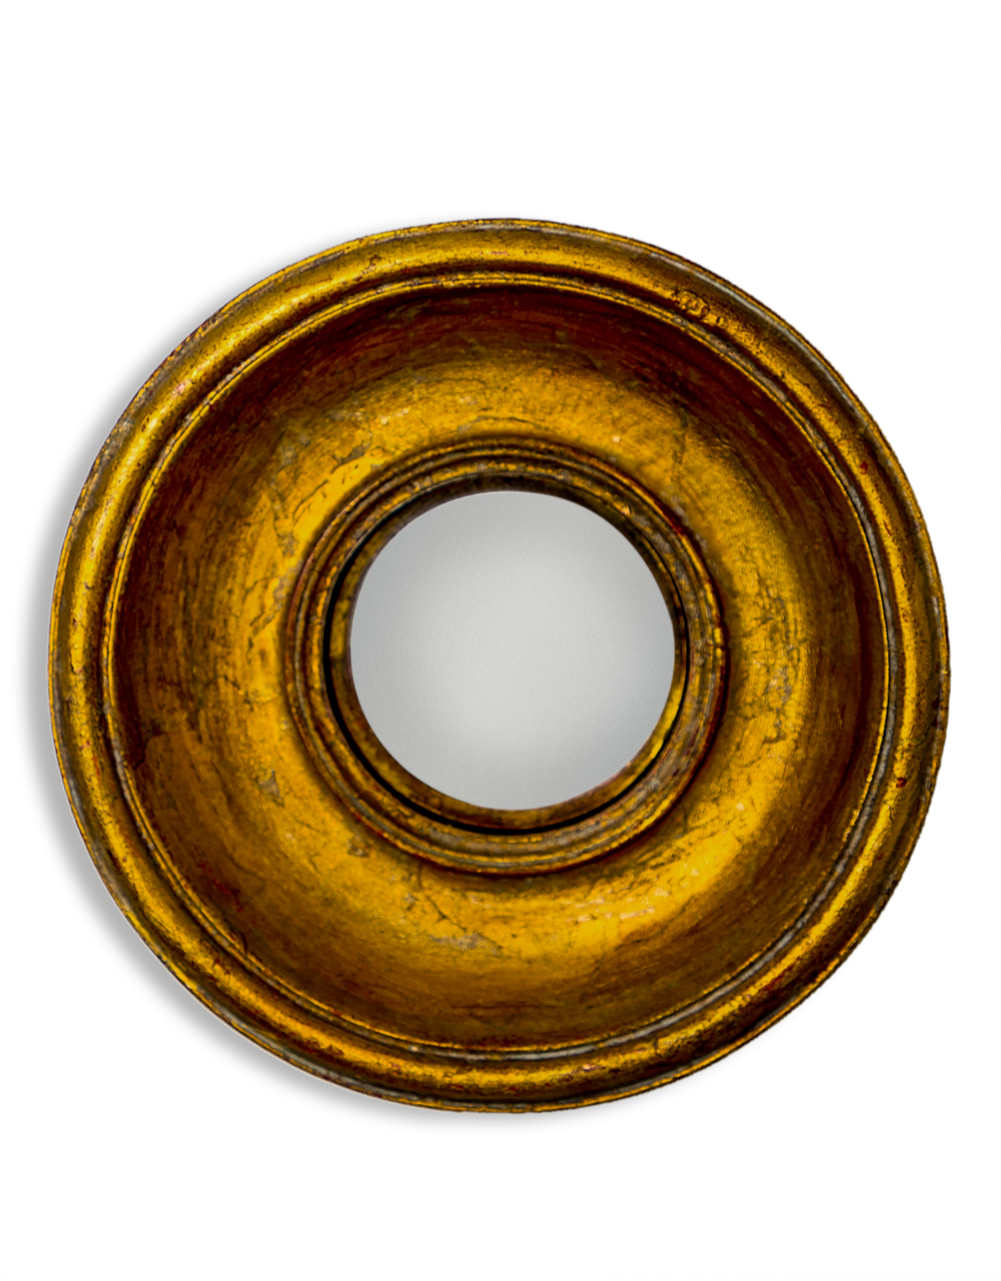 Gold Deep Framed Extra Small Convex Mirror